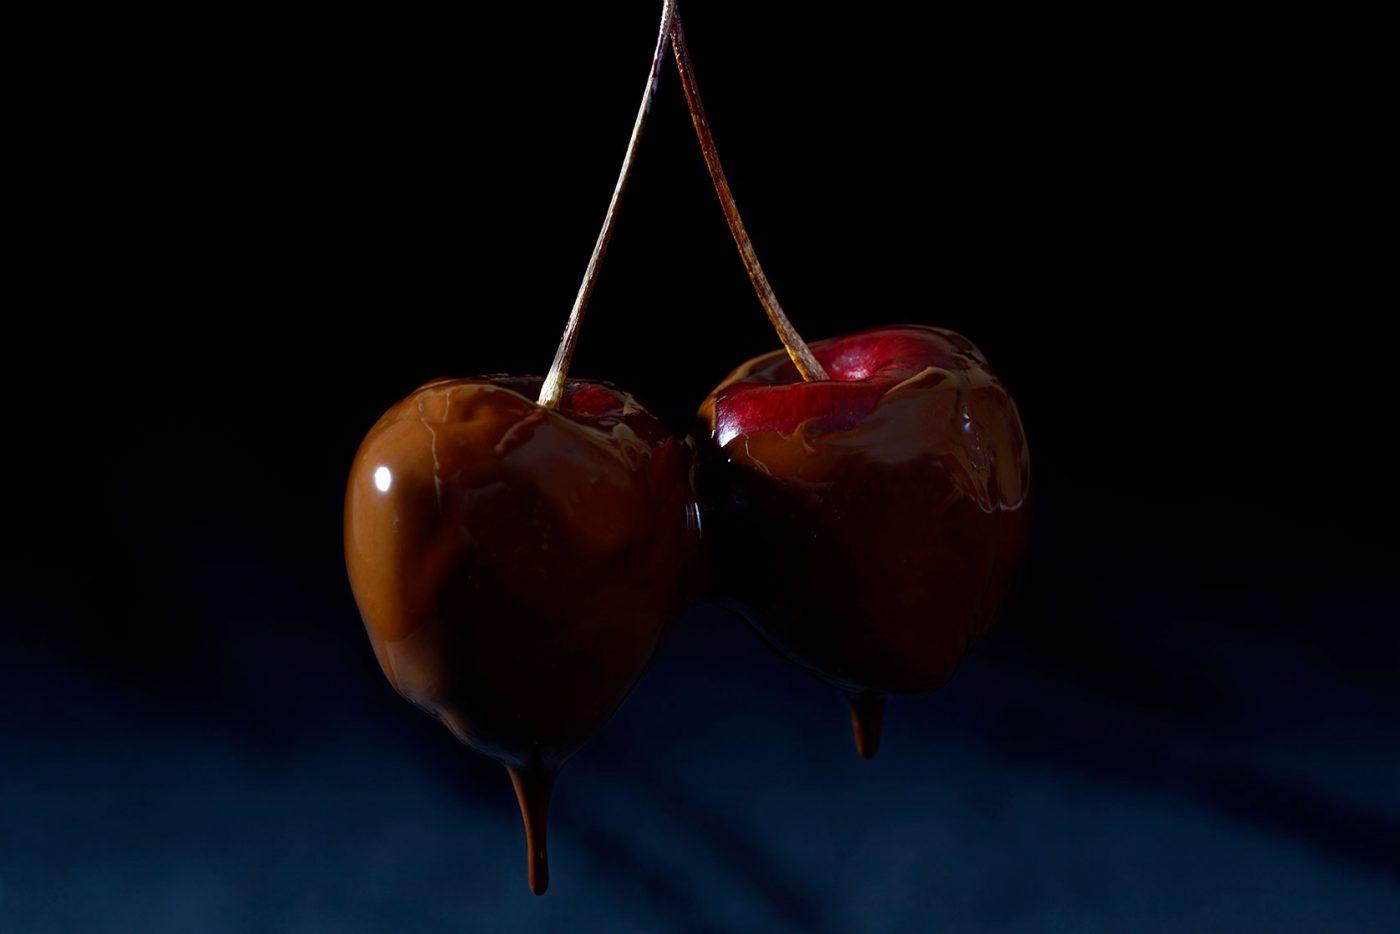 two fresh cherries dripping in chocolate